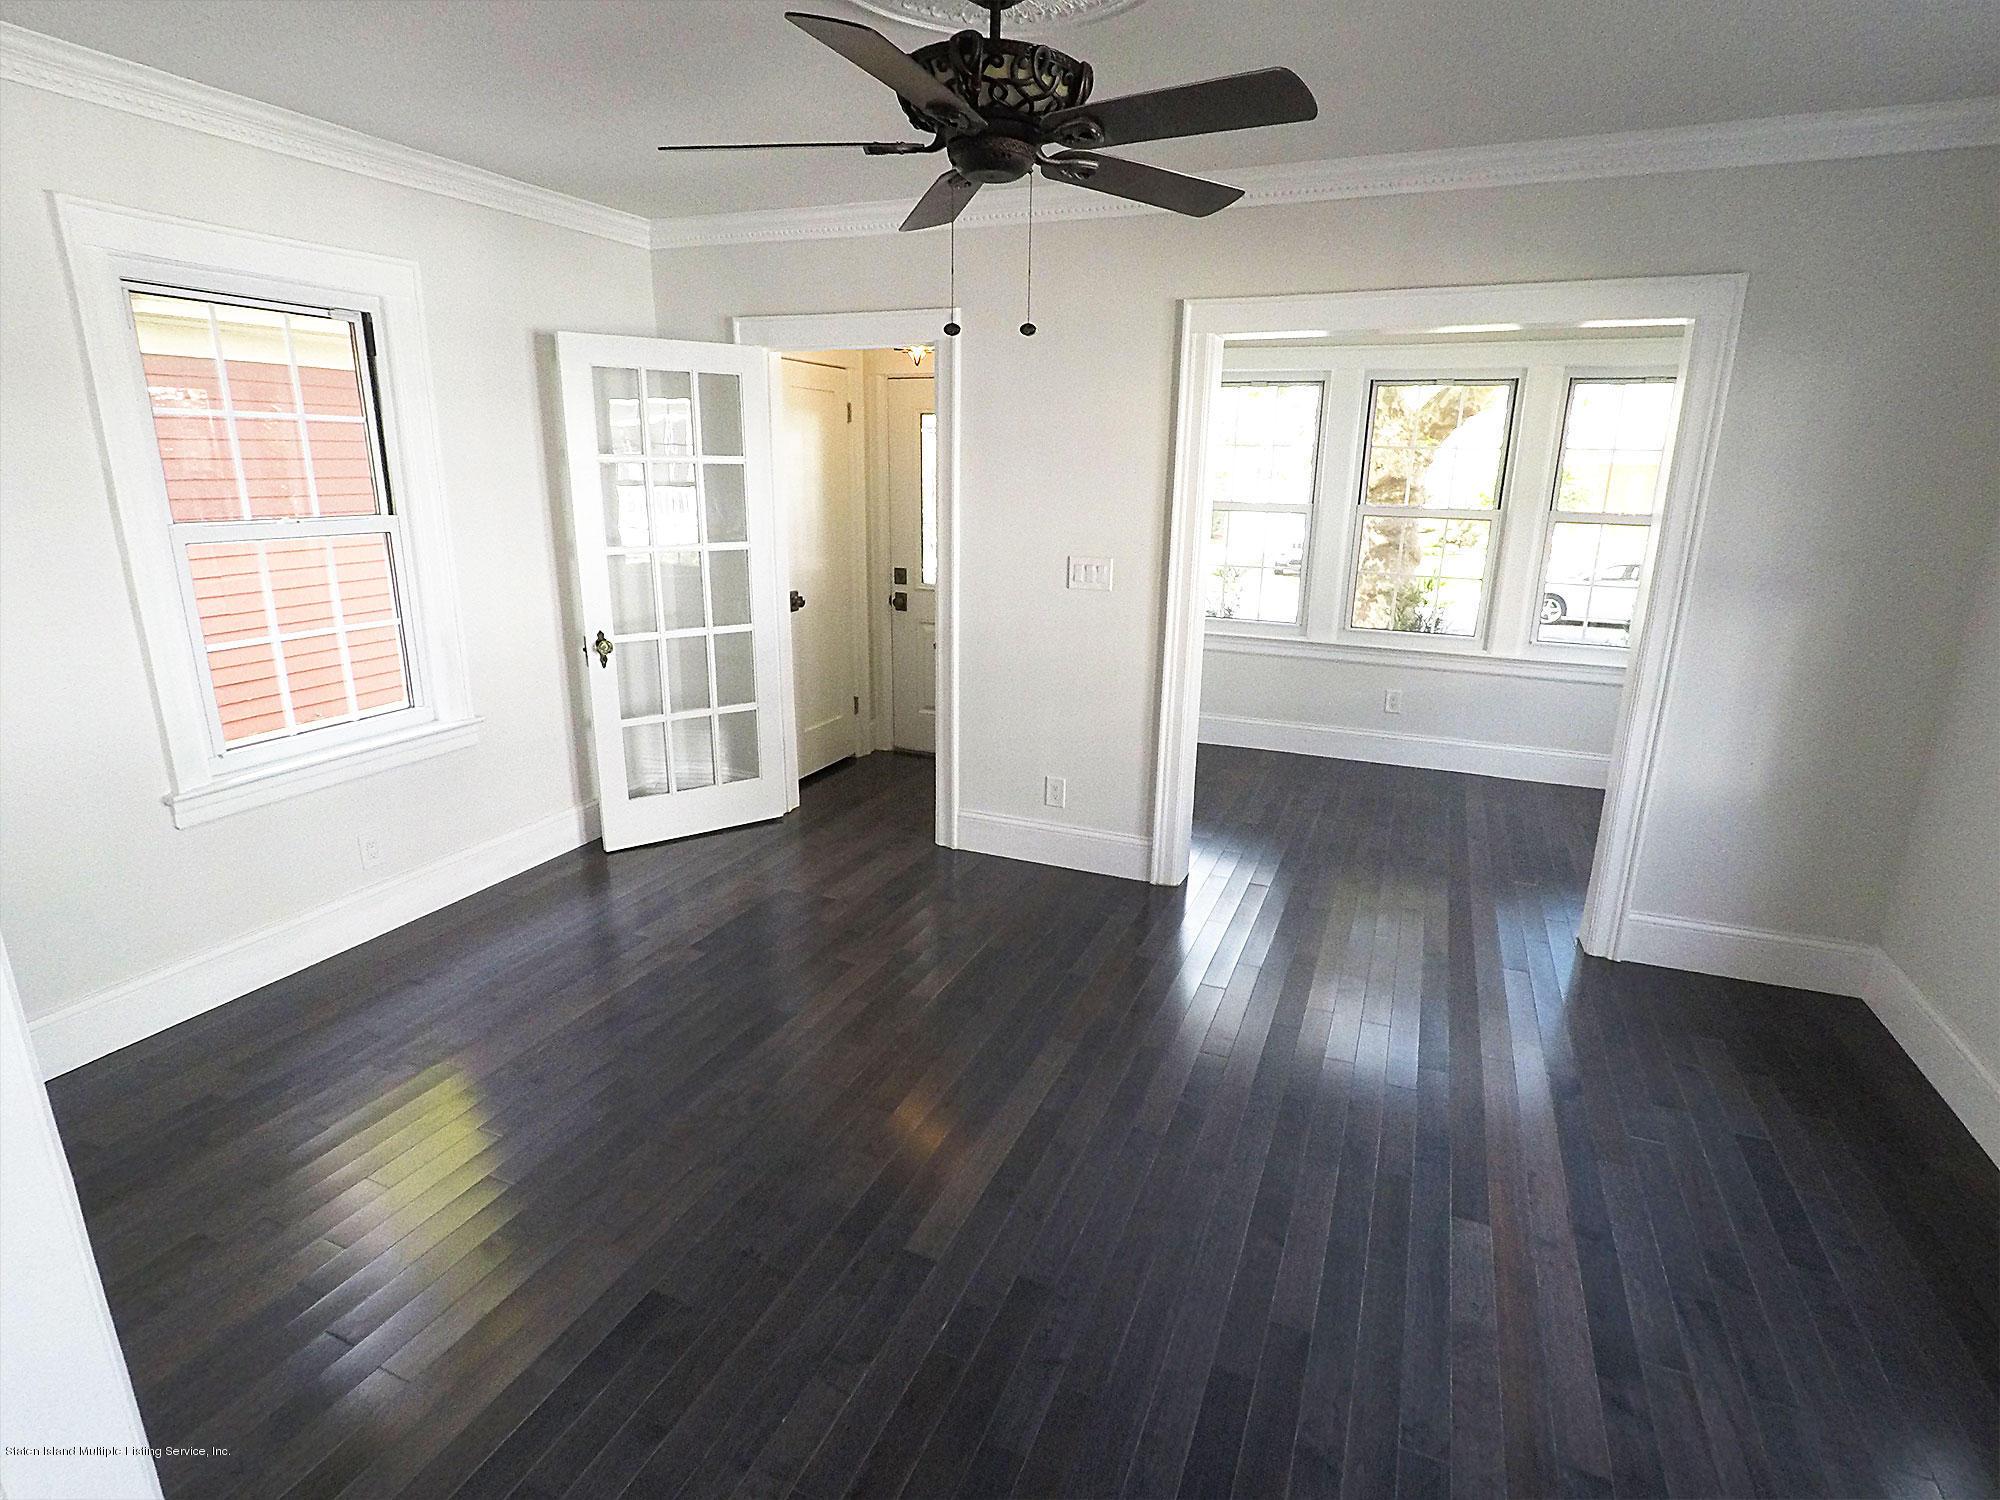 Single Family - Detached 115 Woodbine Avenue  Staten Island, NY 10314, MLS-1123689-4